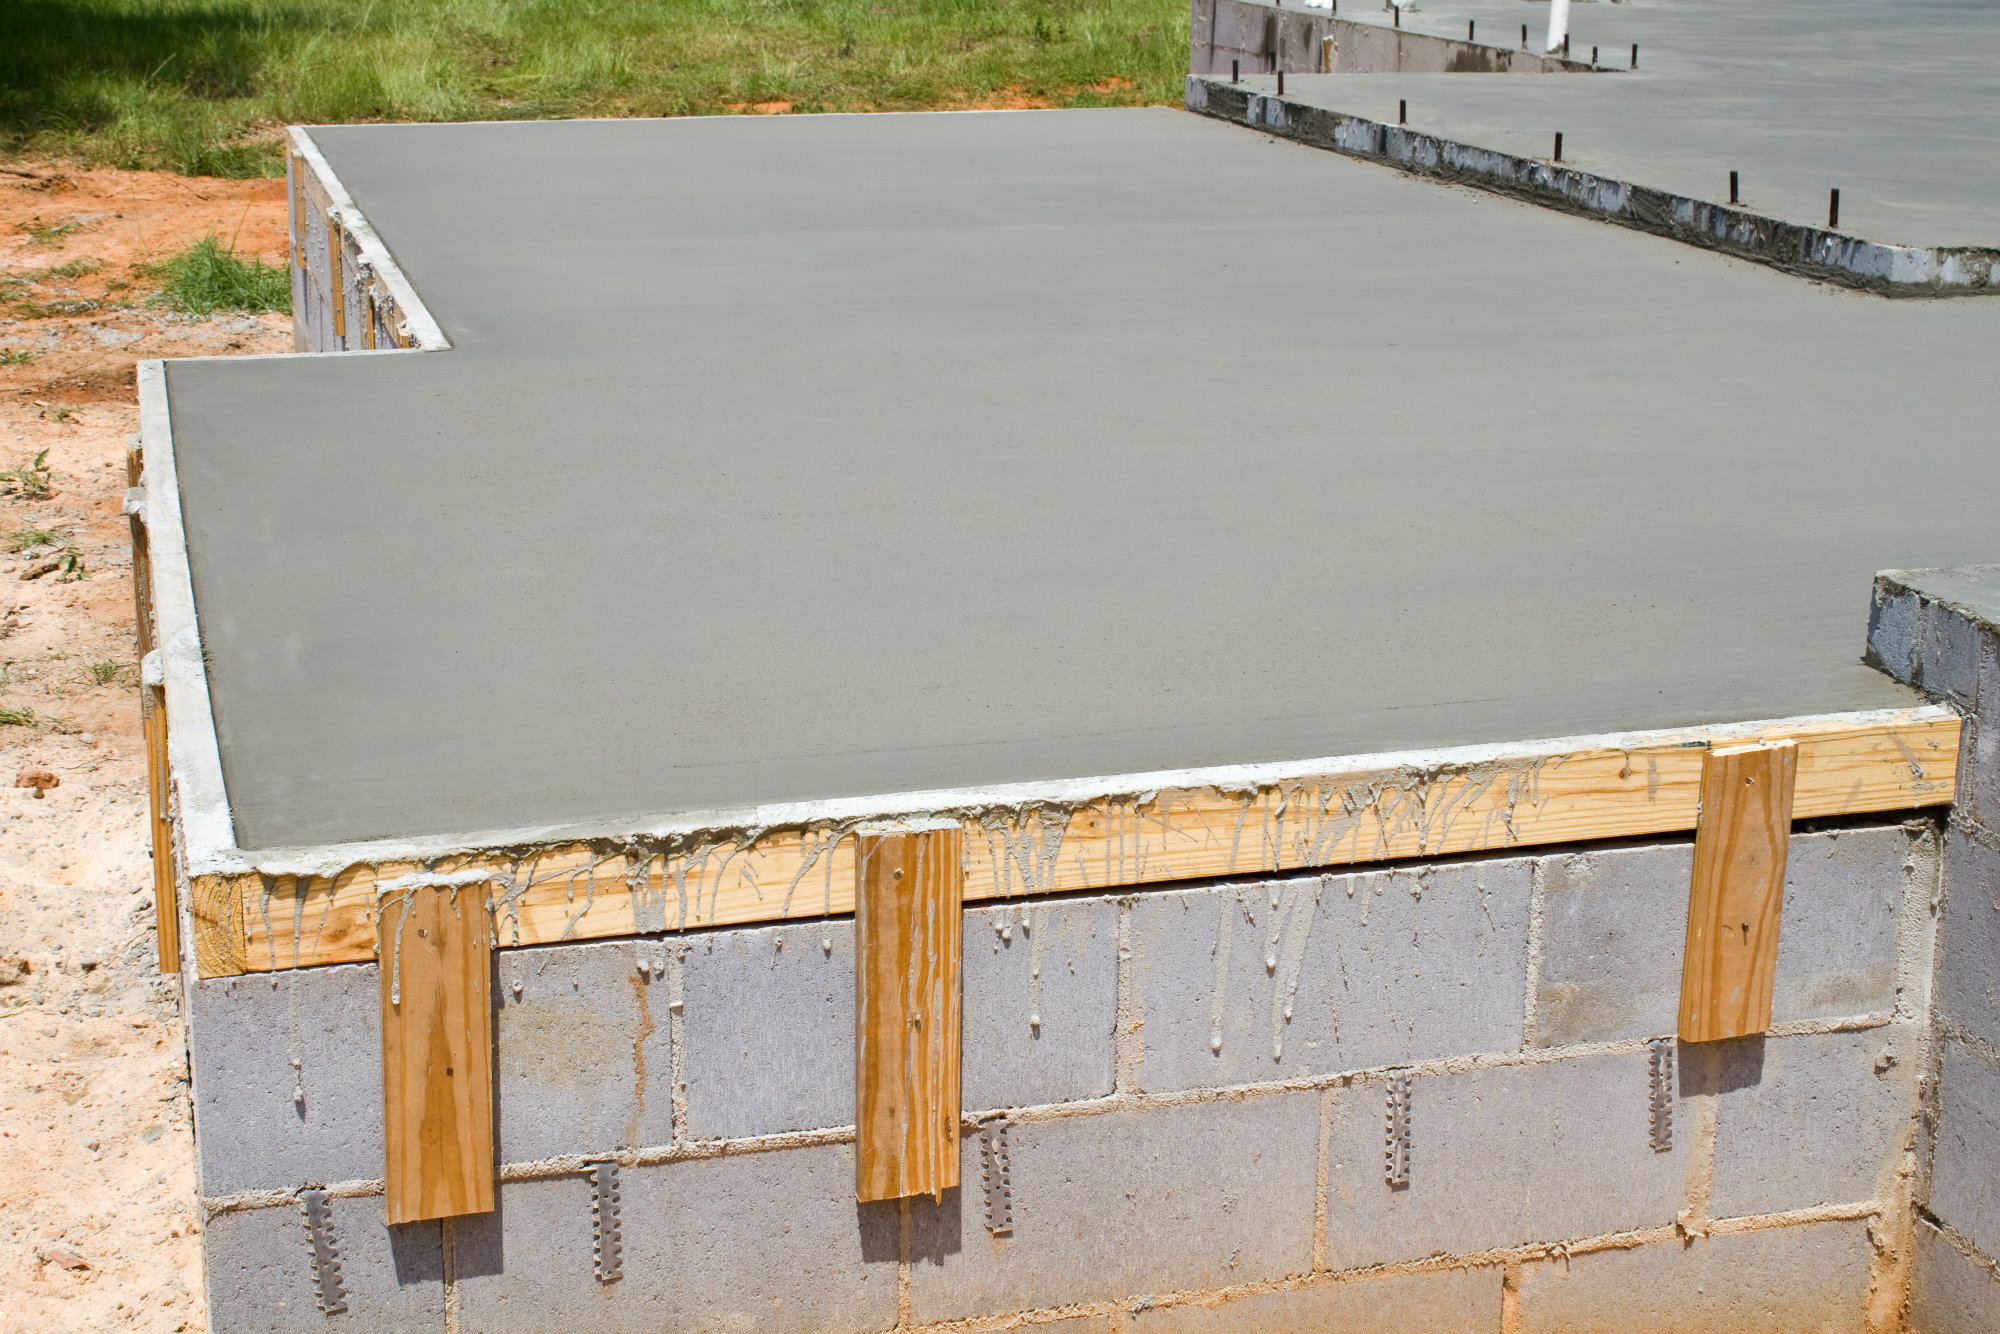 New Partnership Provides Maximum Value and Performance for Concrete Floor  Slab Designs| Concrete Construction Magazine